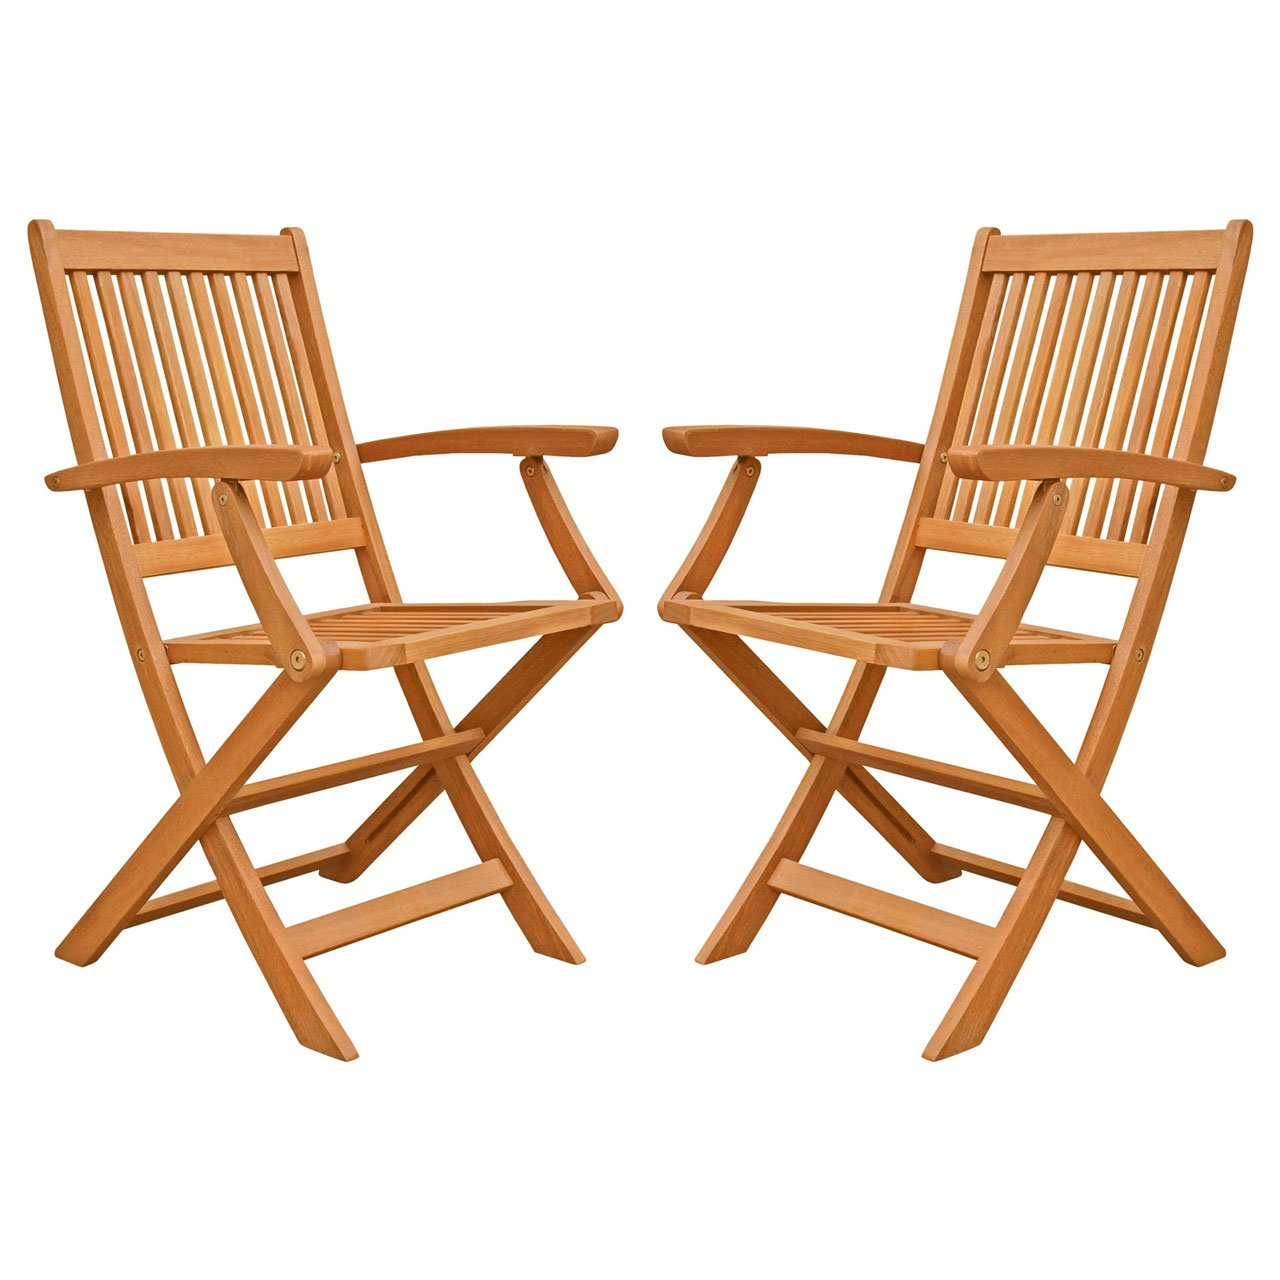 LuuNguyen Win Outdoor Hardwood Folding Arm Chair, Natural Wood Finish, Set  Of 2